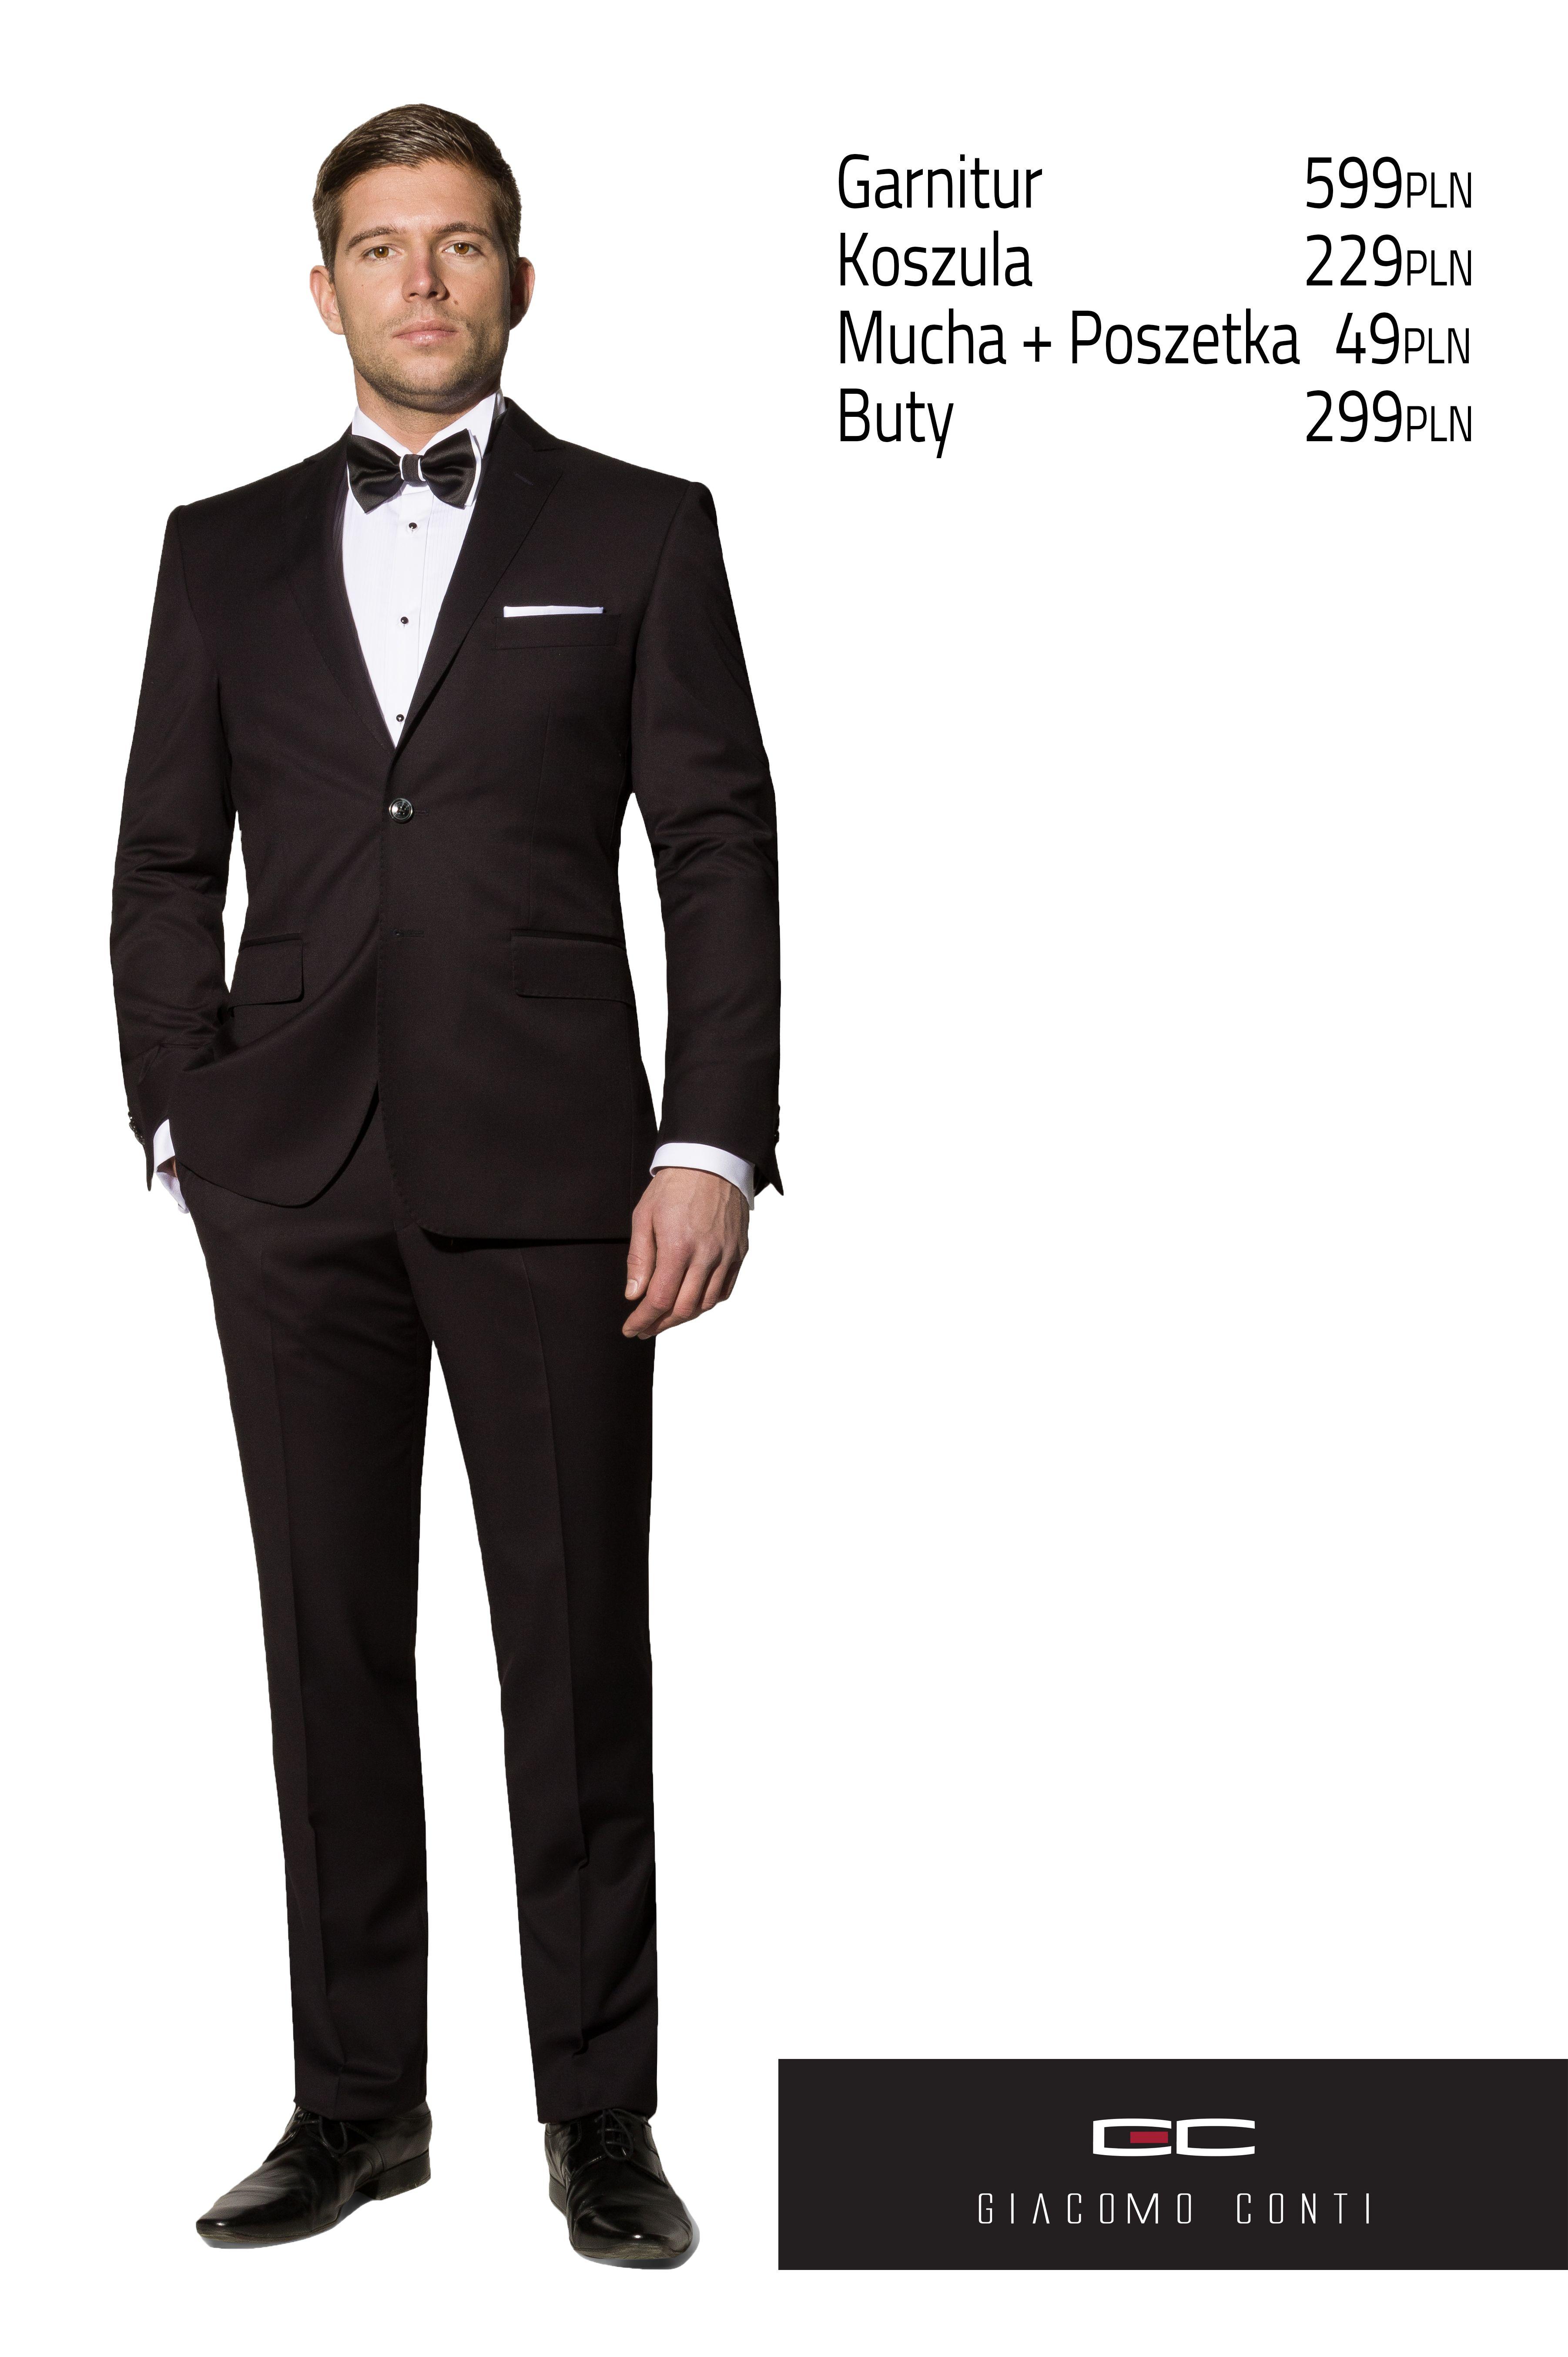 e64f1b5a0396d Stylizacja Giacomo Conti - czarny garnitur Marco 2 A13/37P i biała koszula  Adamo P